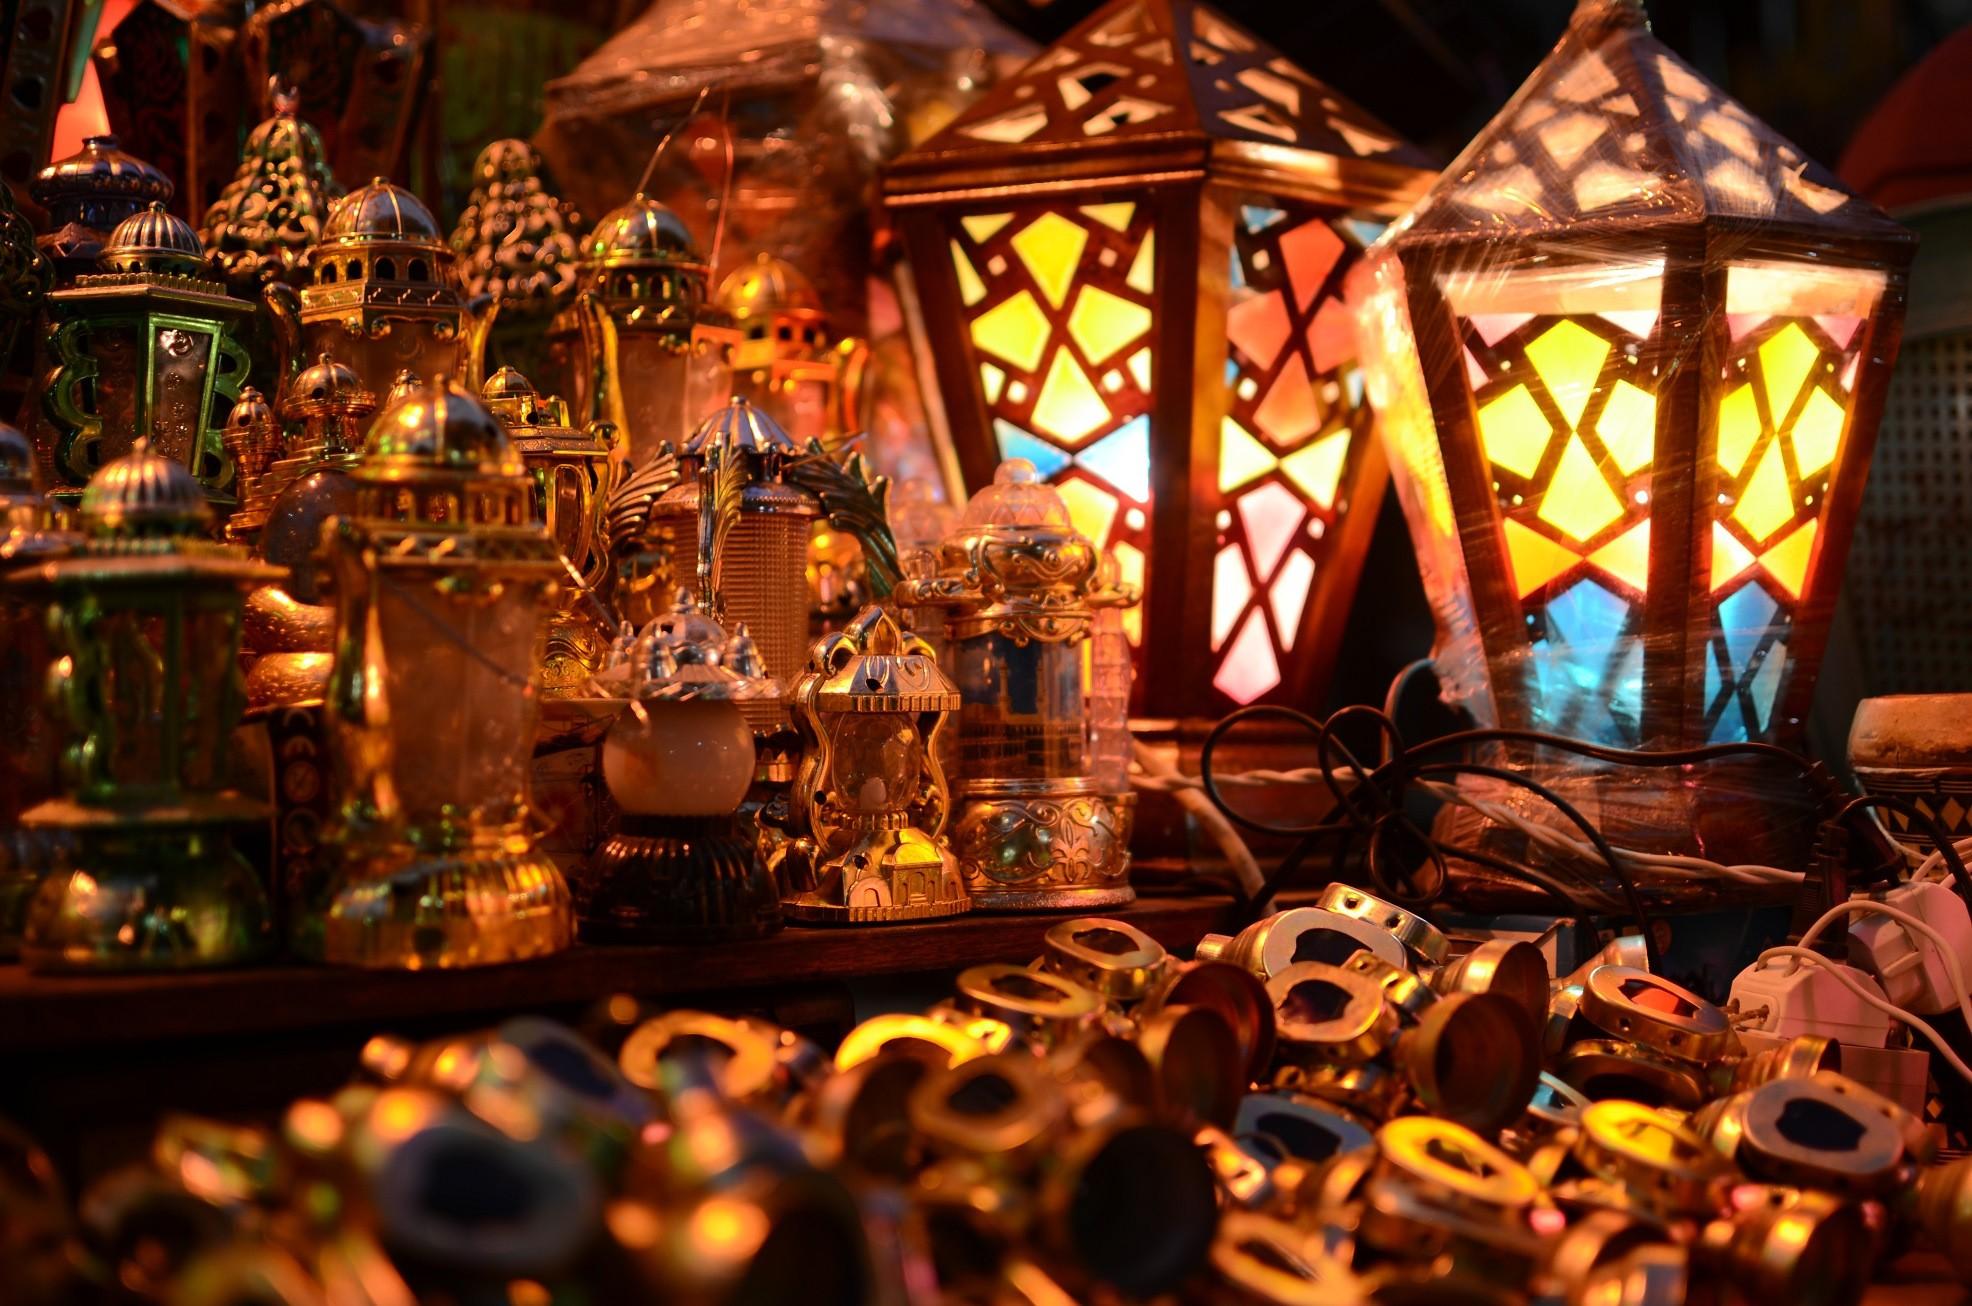 صور رمضان 2020 أجمل صور فوانيس رمضان 2021 بطاقات تهنئة لرمضان تهنئة رمضان بالأسماء 7